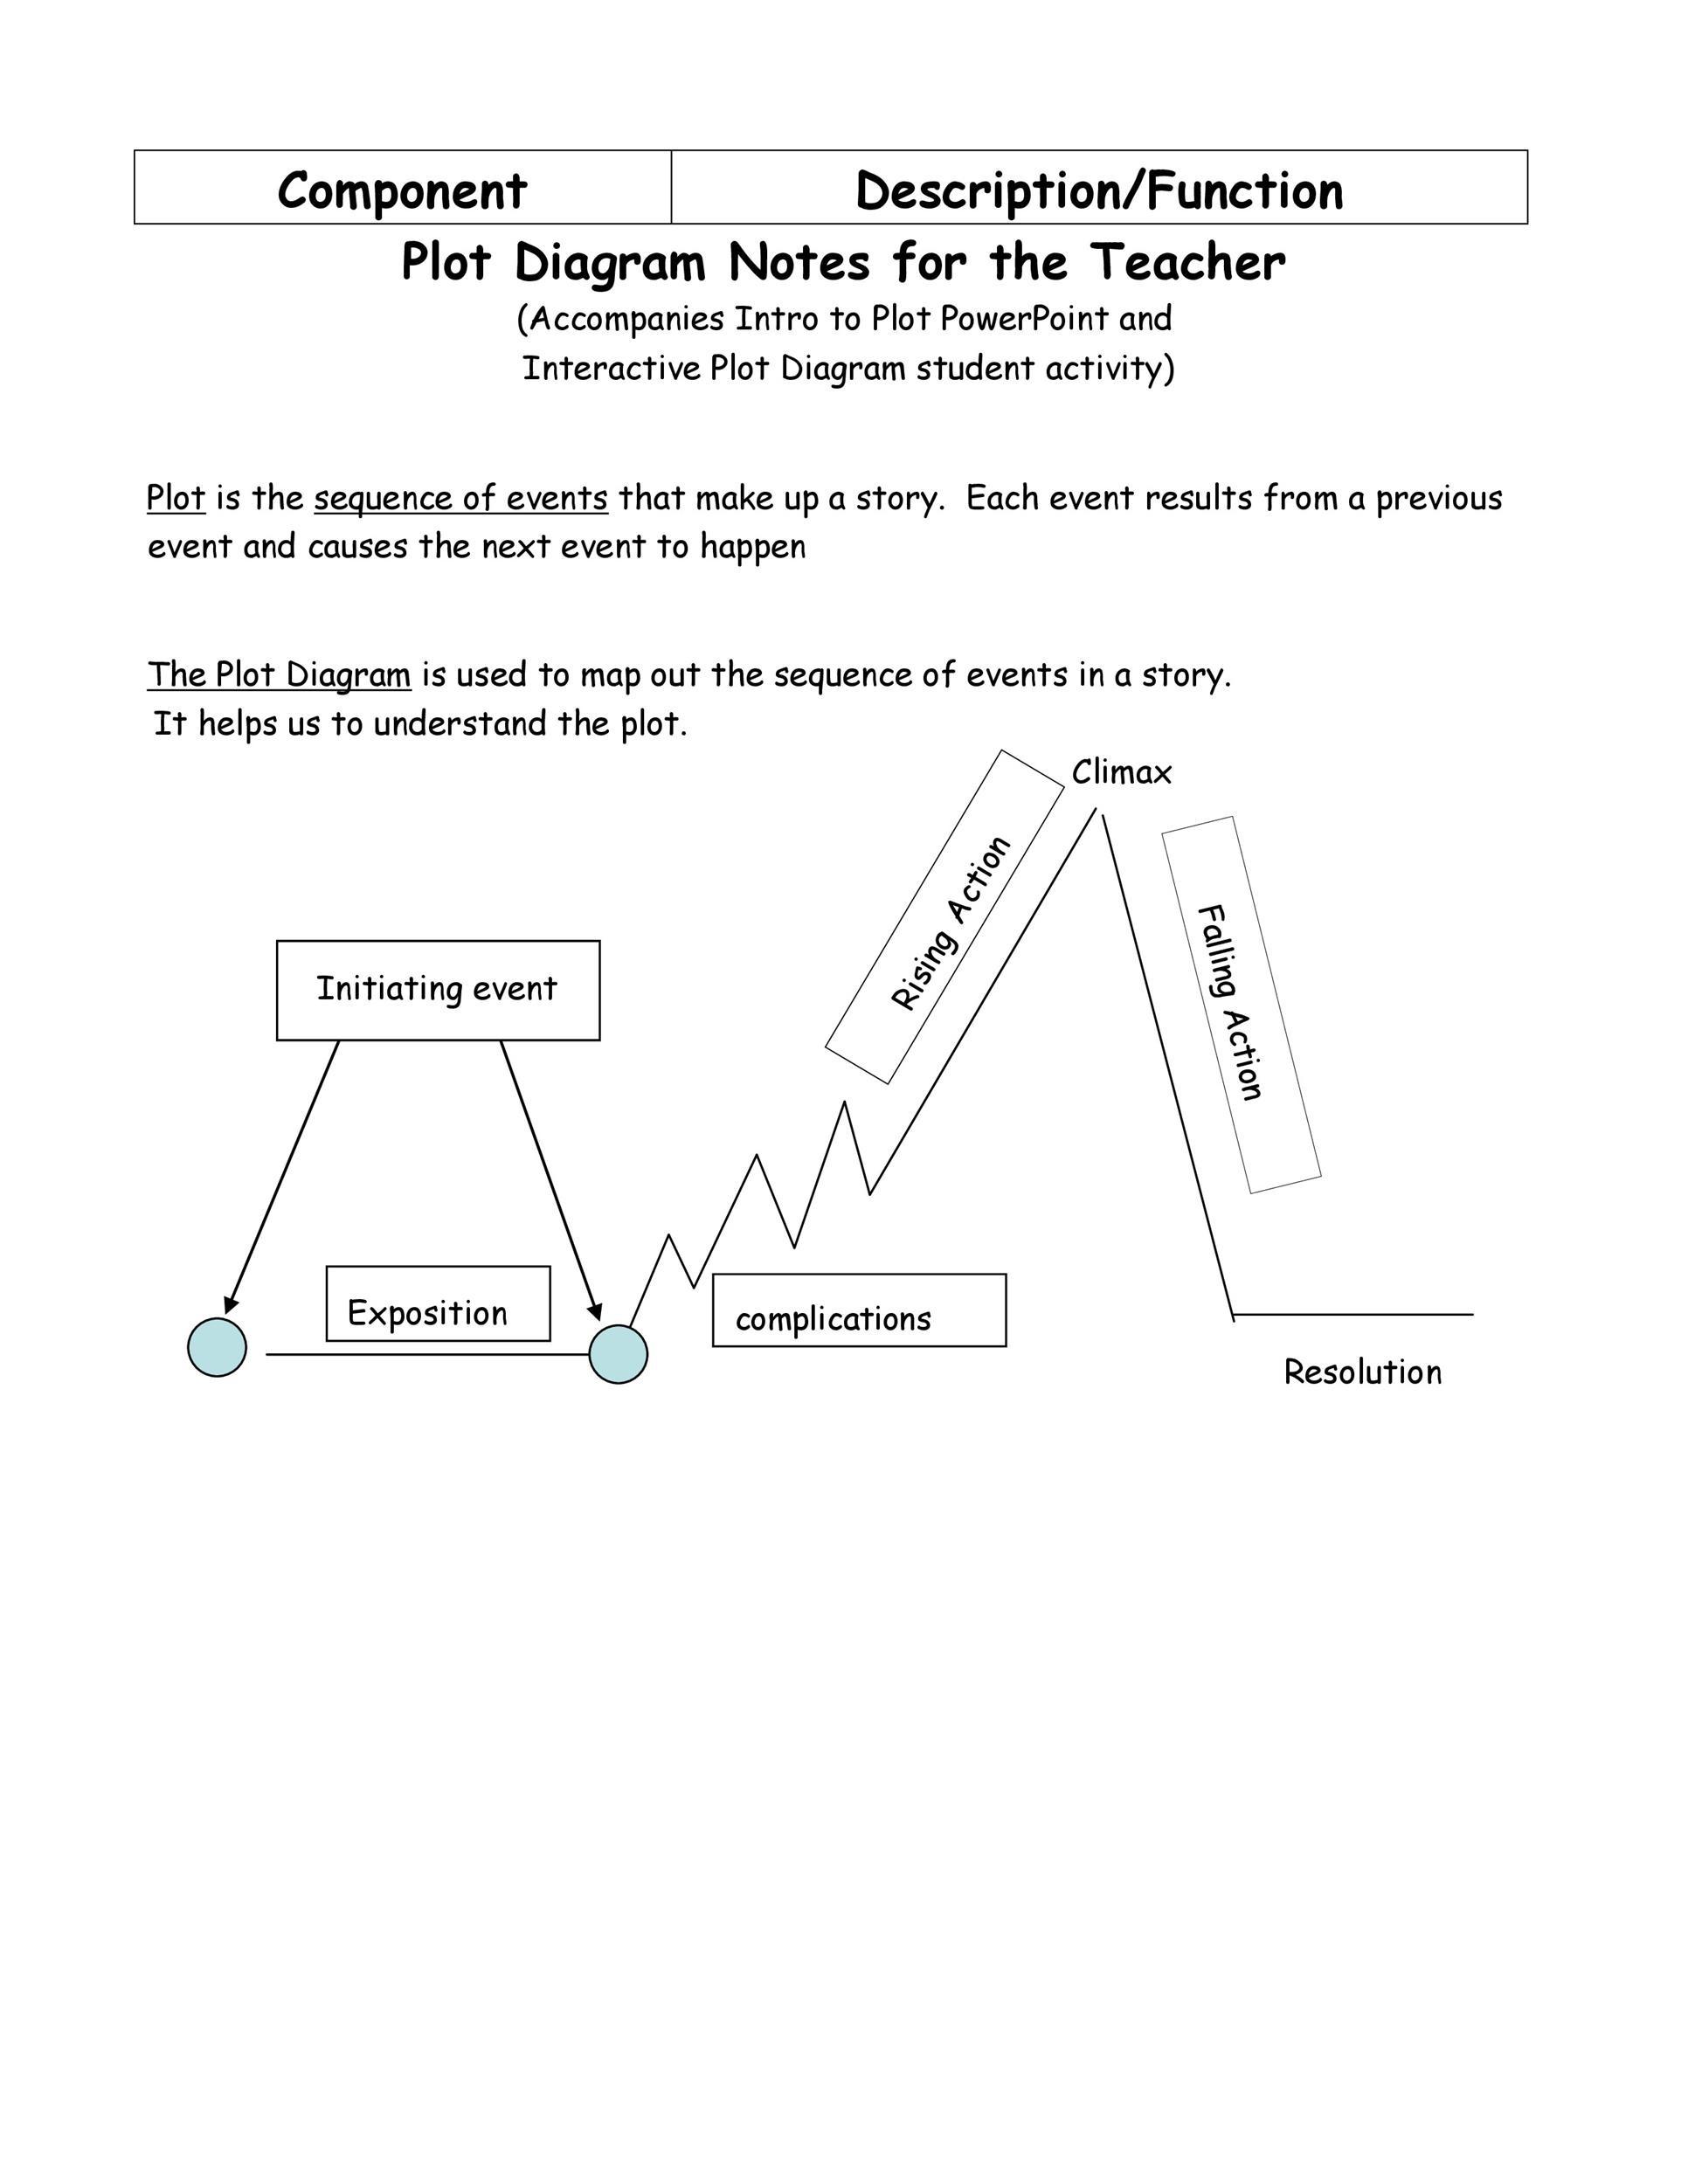 45 Professional Plot Diagram Templates (Plot Pyramid) - Template Lab